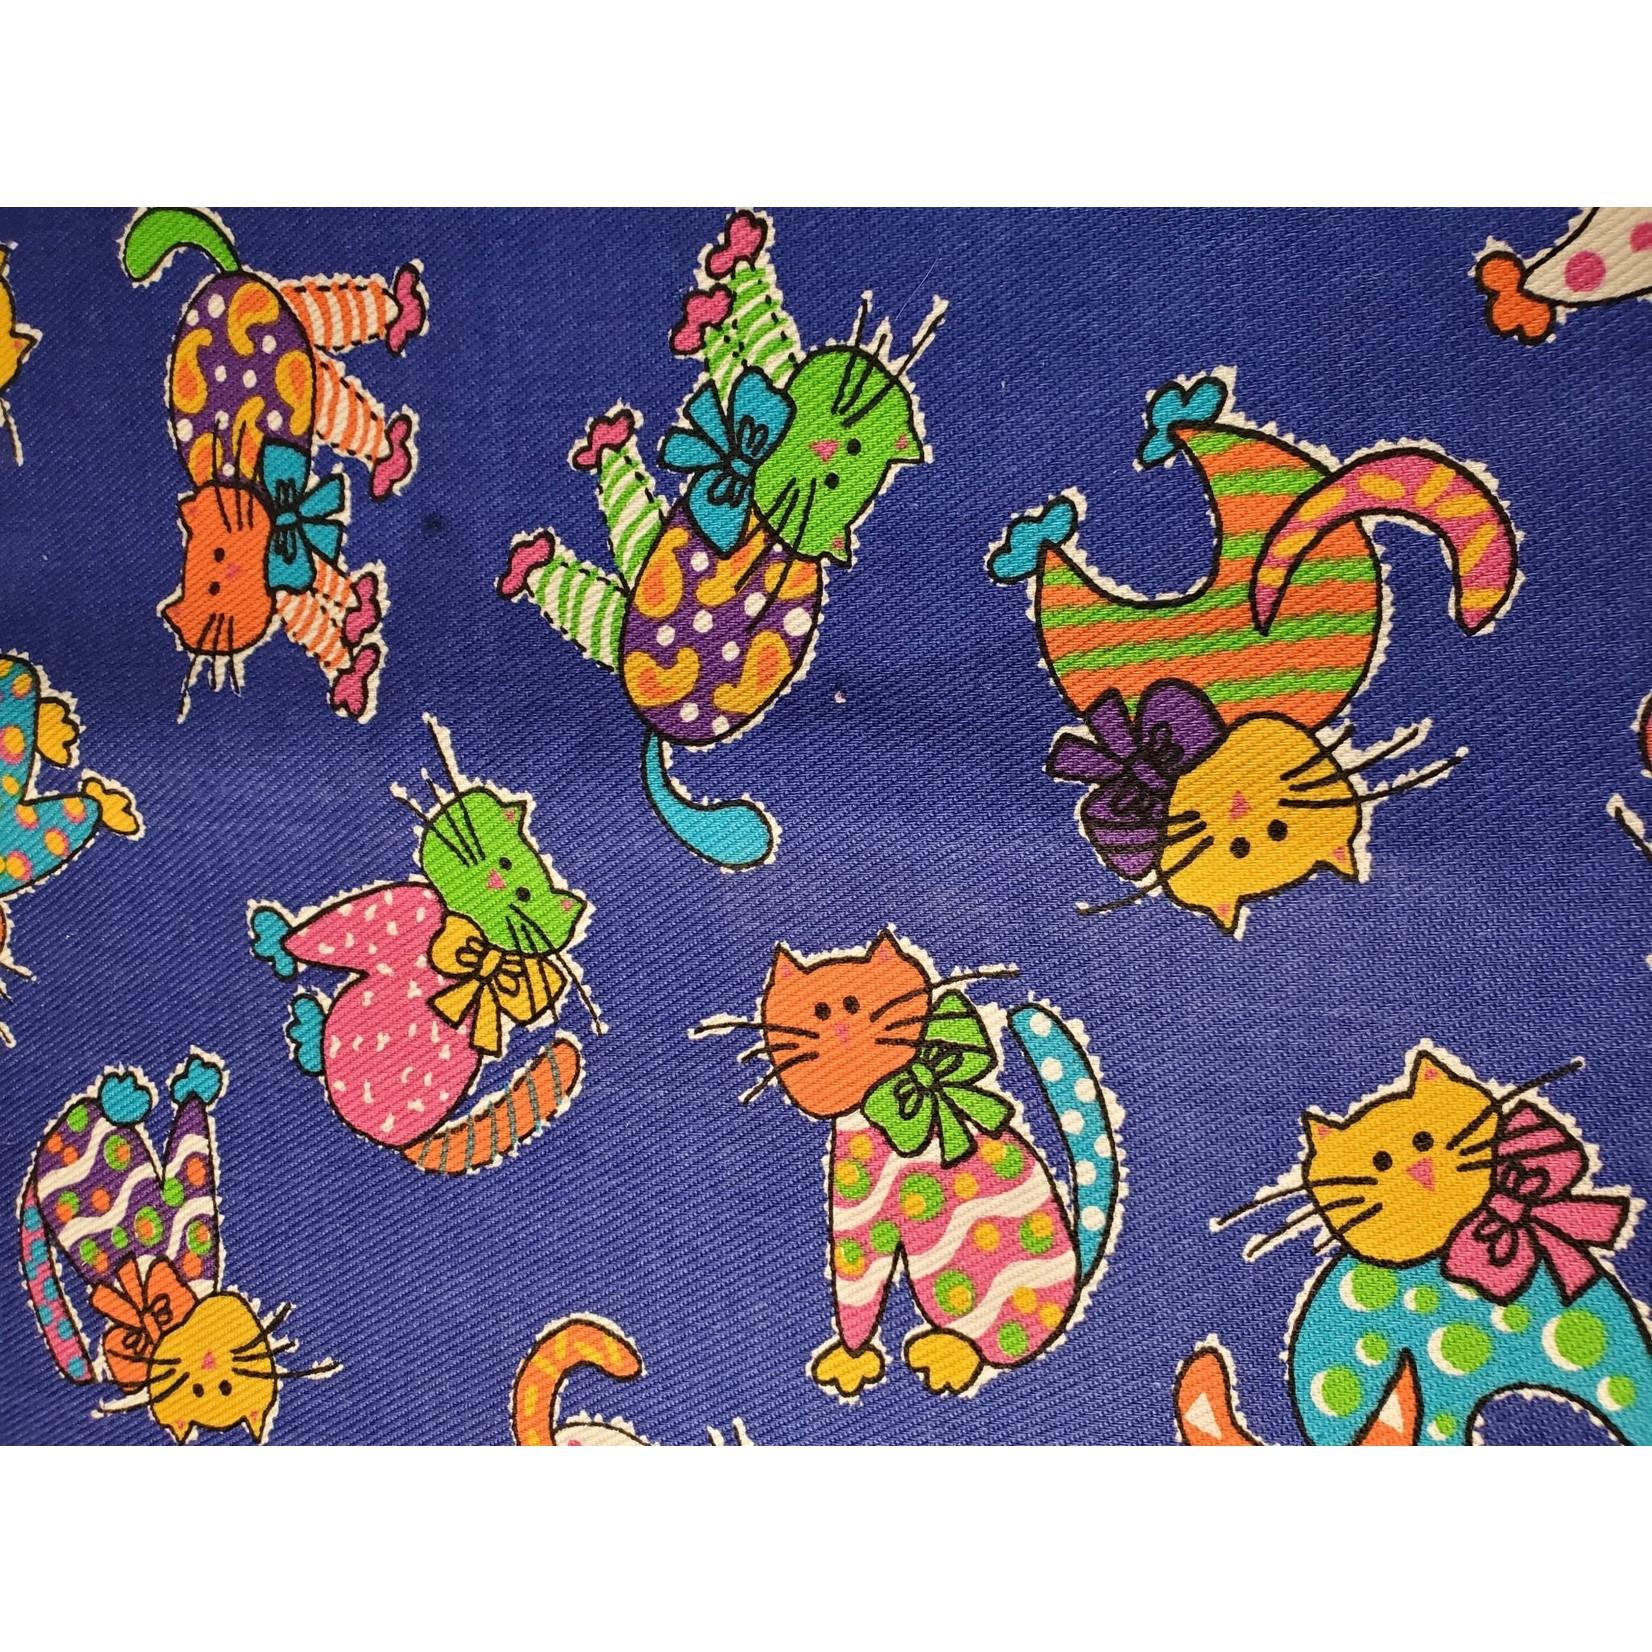 Children's Fabric Options